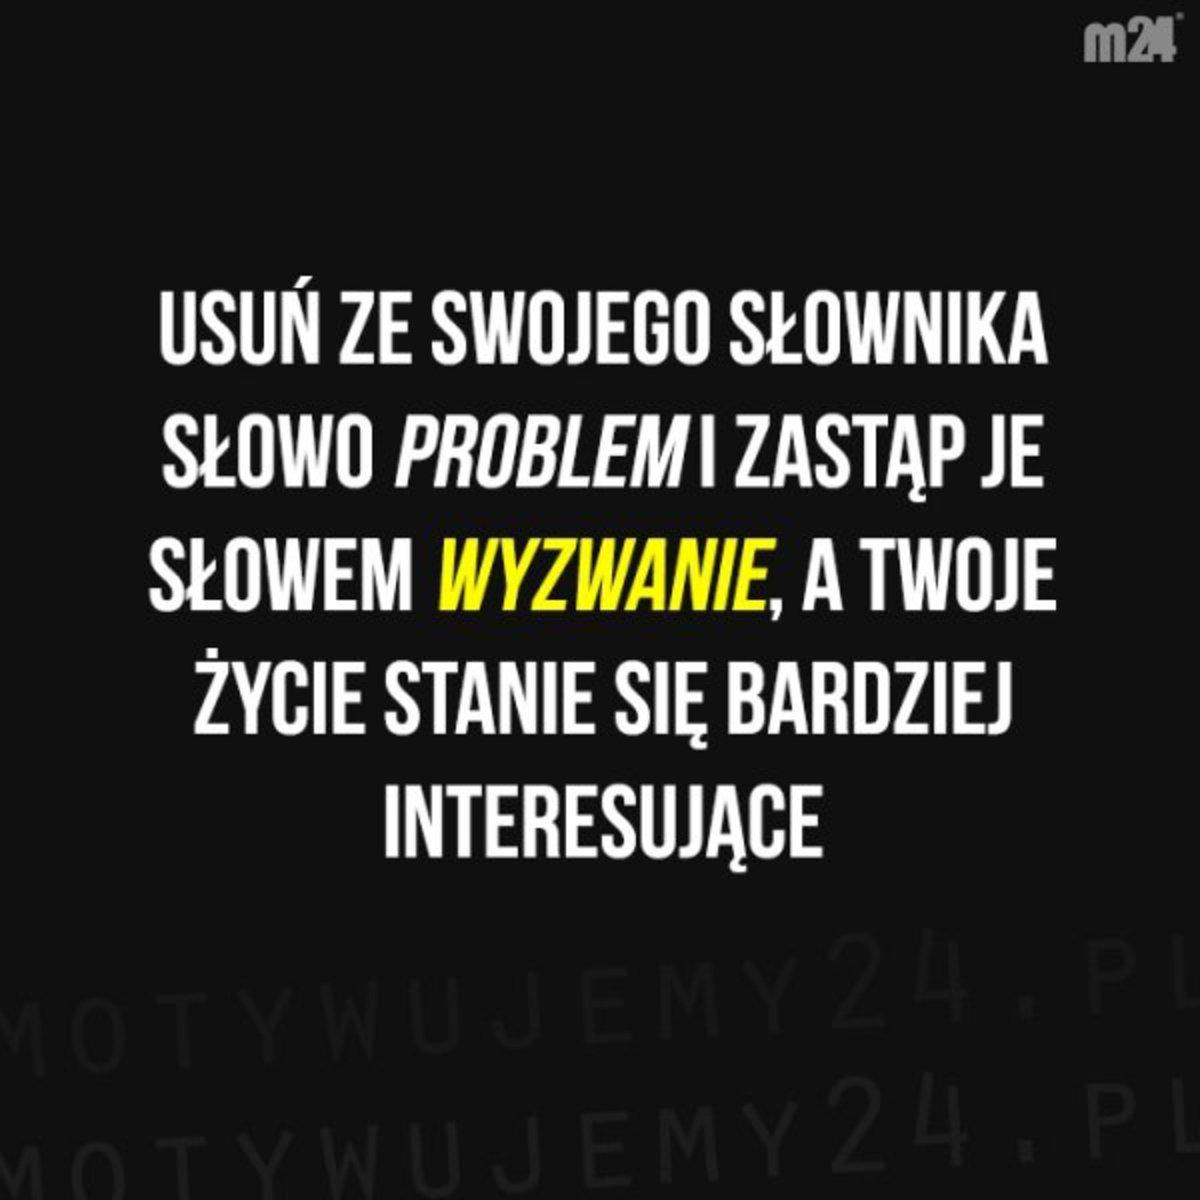 Randka - Babimost - Lubuskie Polska - Ogoszenia kontaktowe